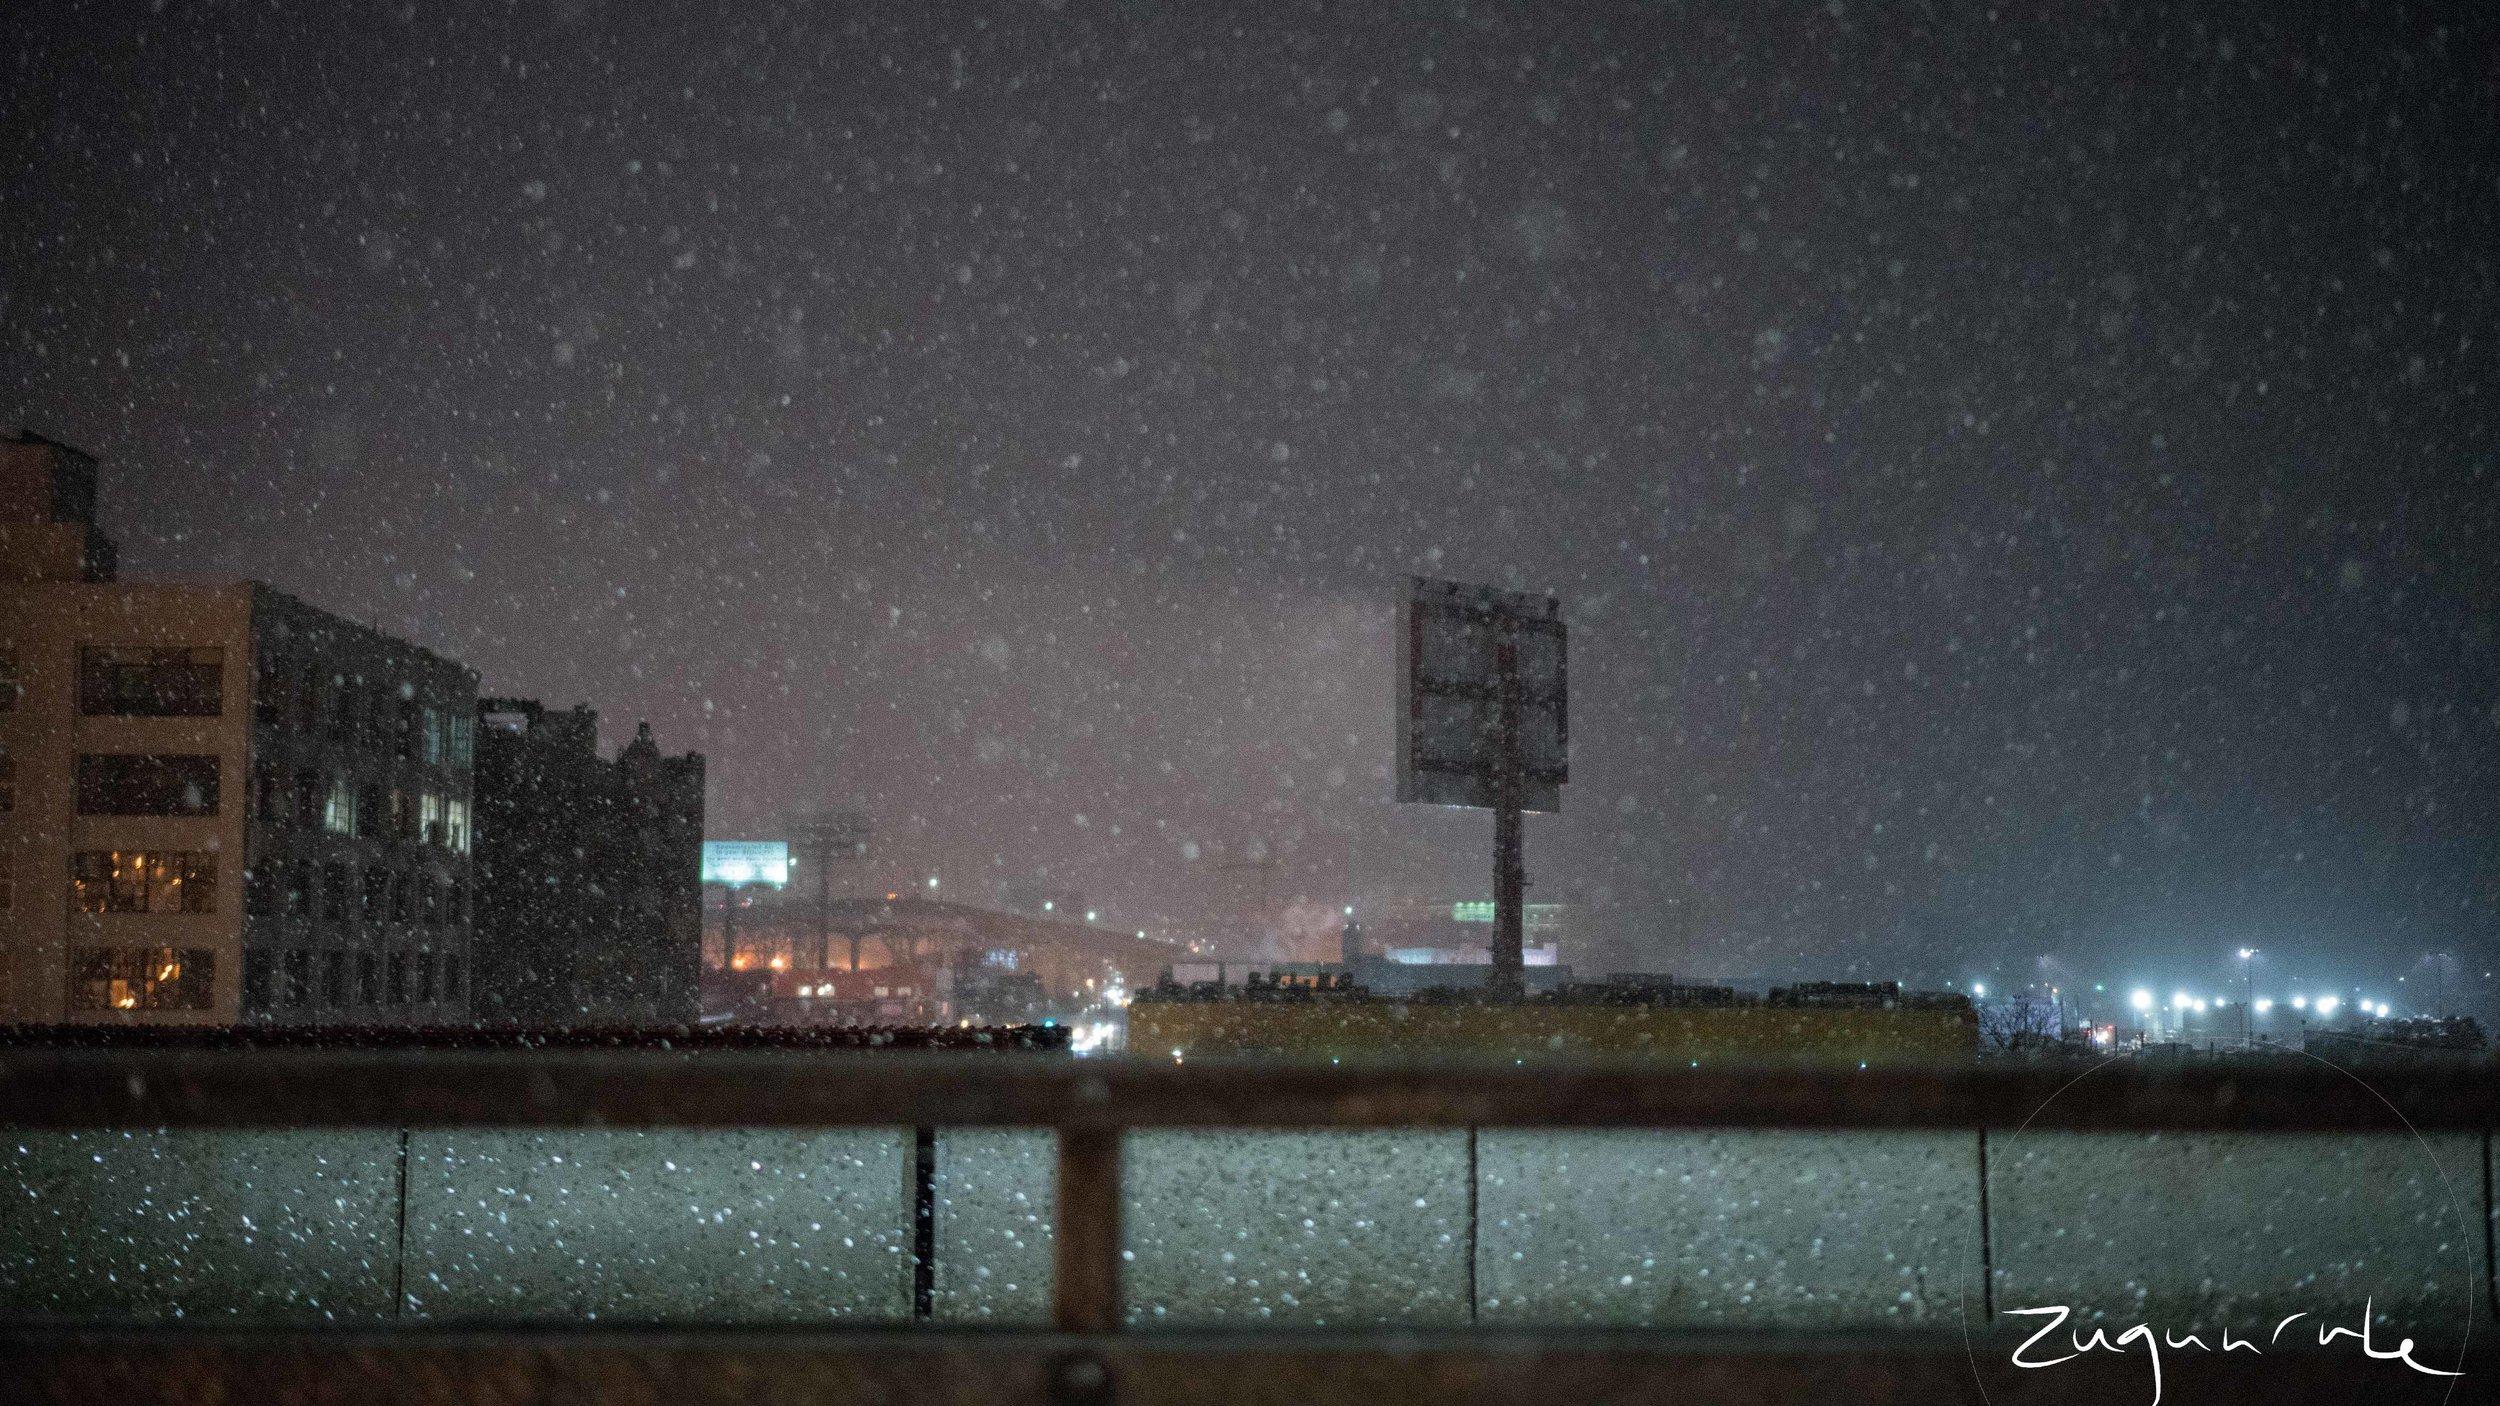 Last December's first snow over the Pulaski Bridge